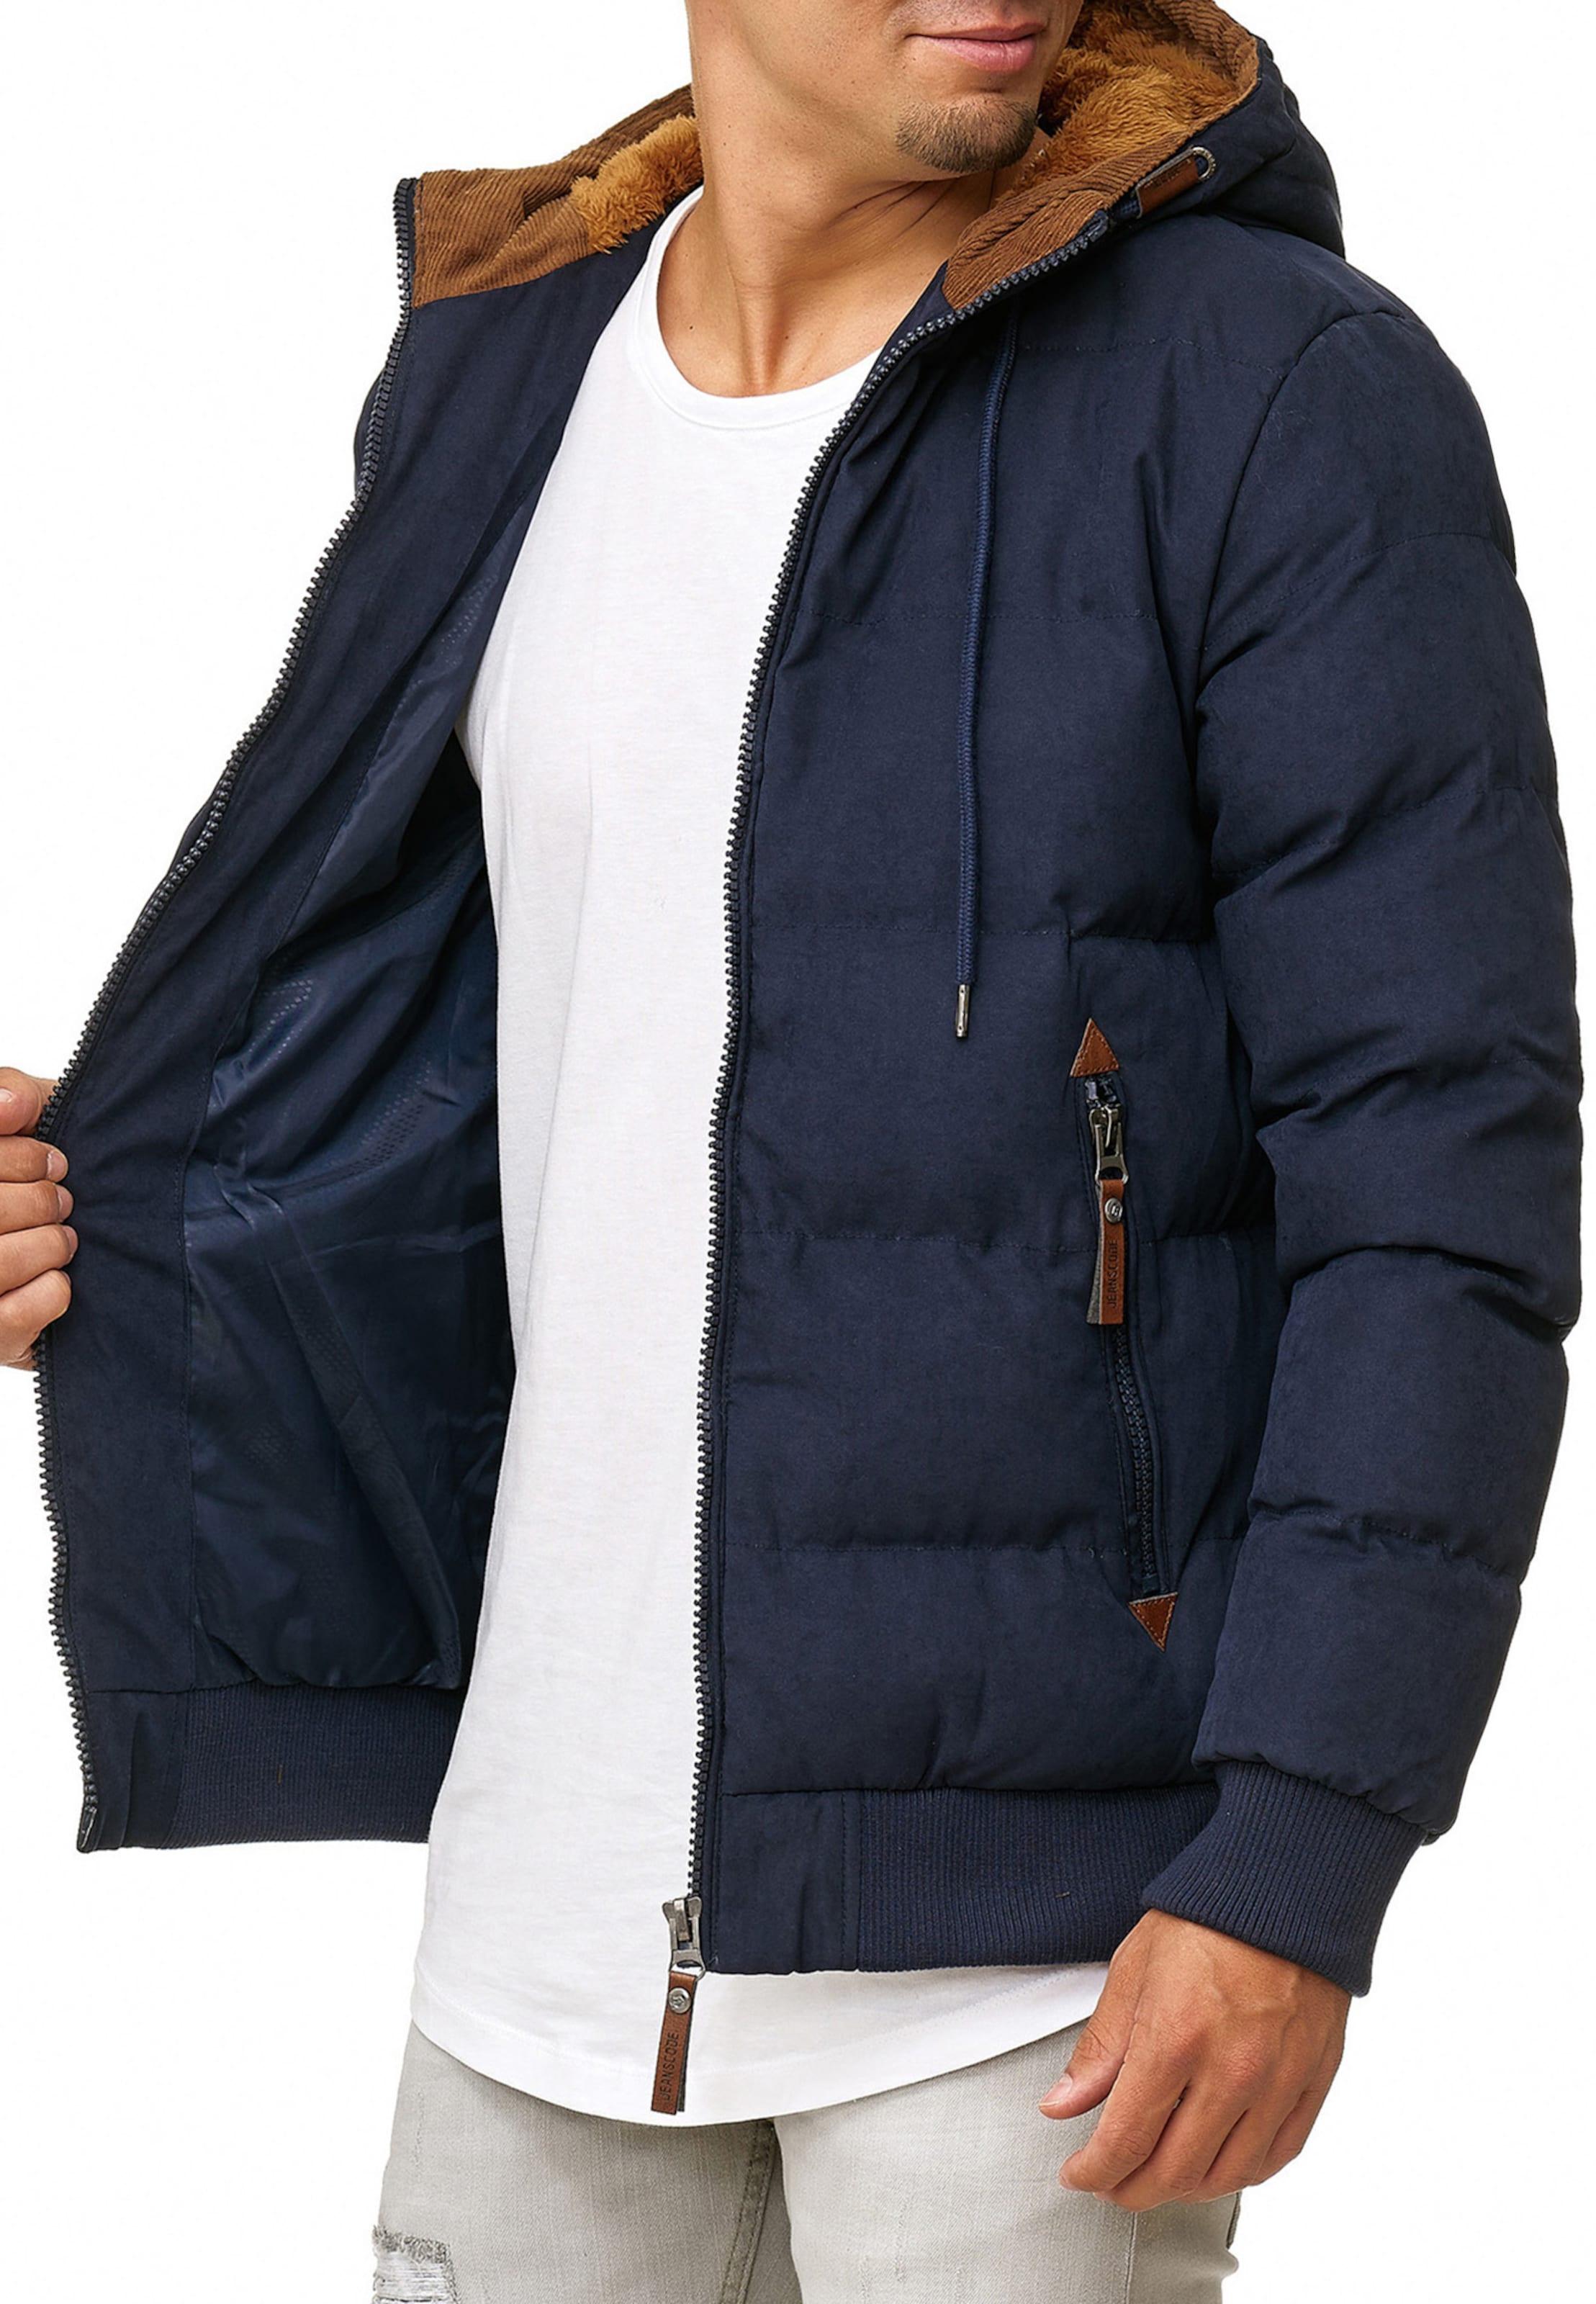 D'hiver En Indicode MarineMarron 'adeline' Jeans Bleu Veste mvNn08wPOy